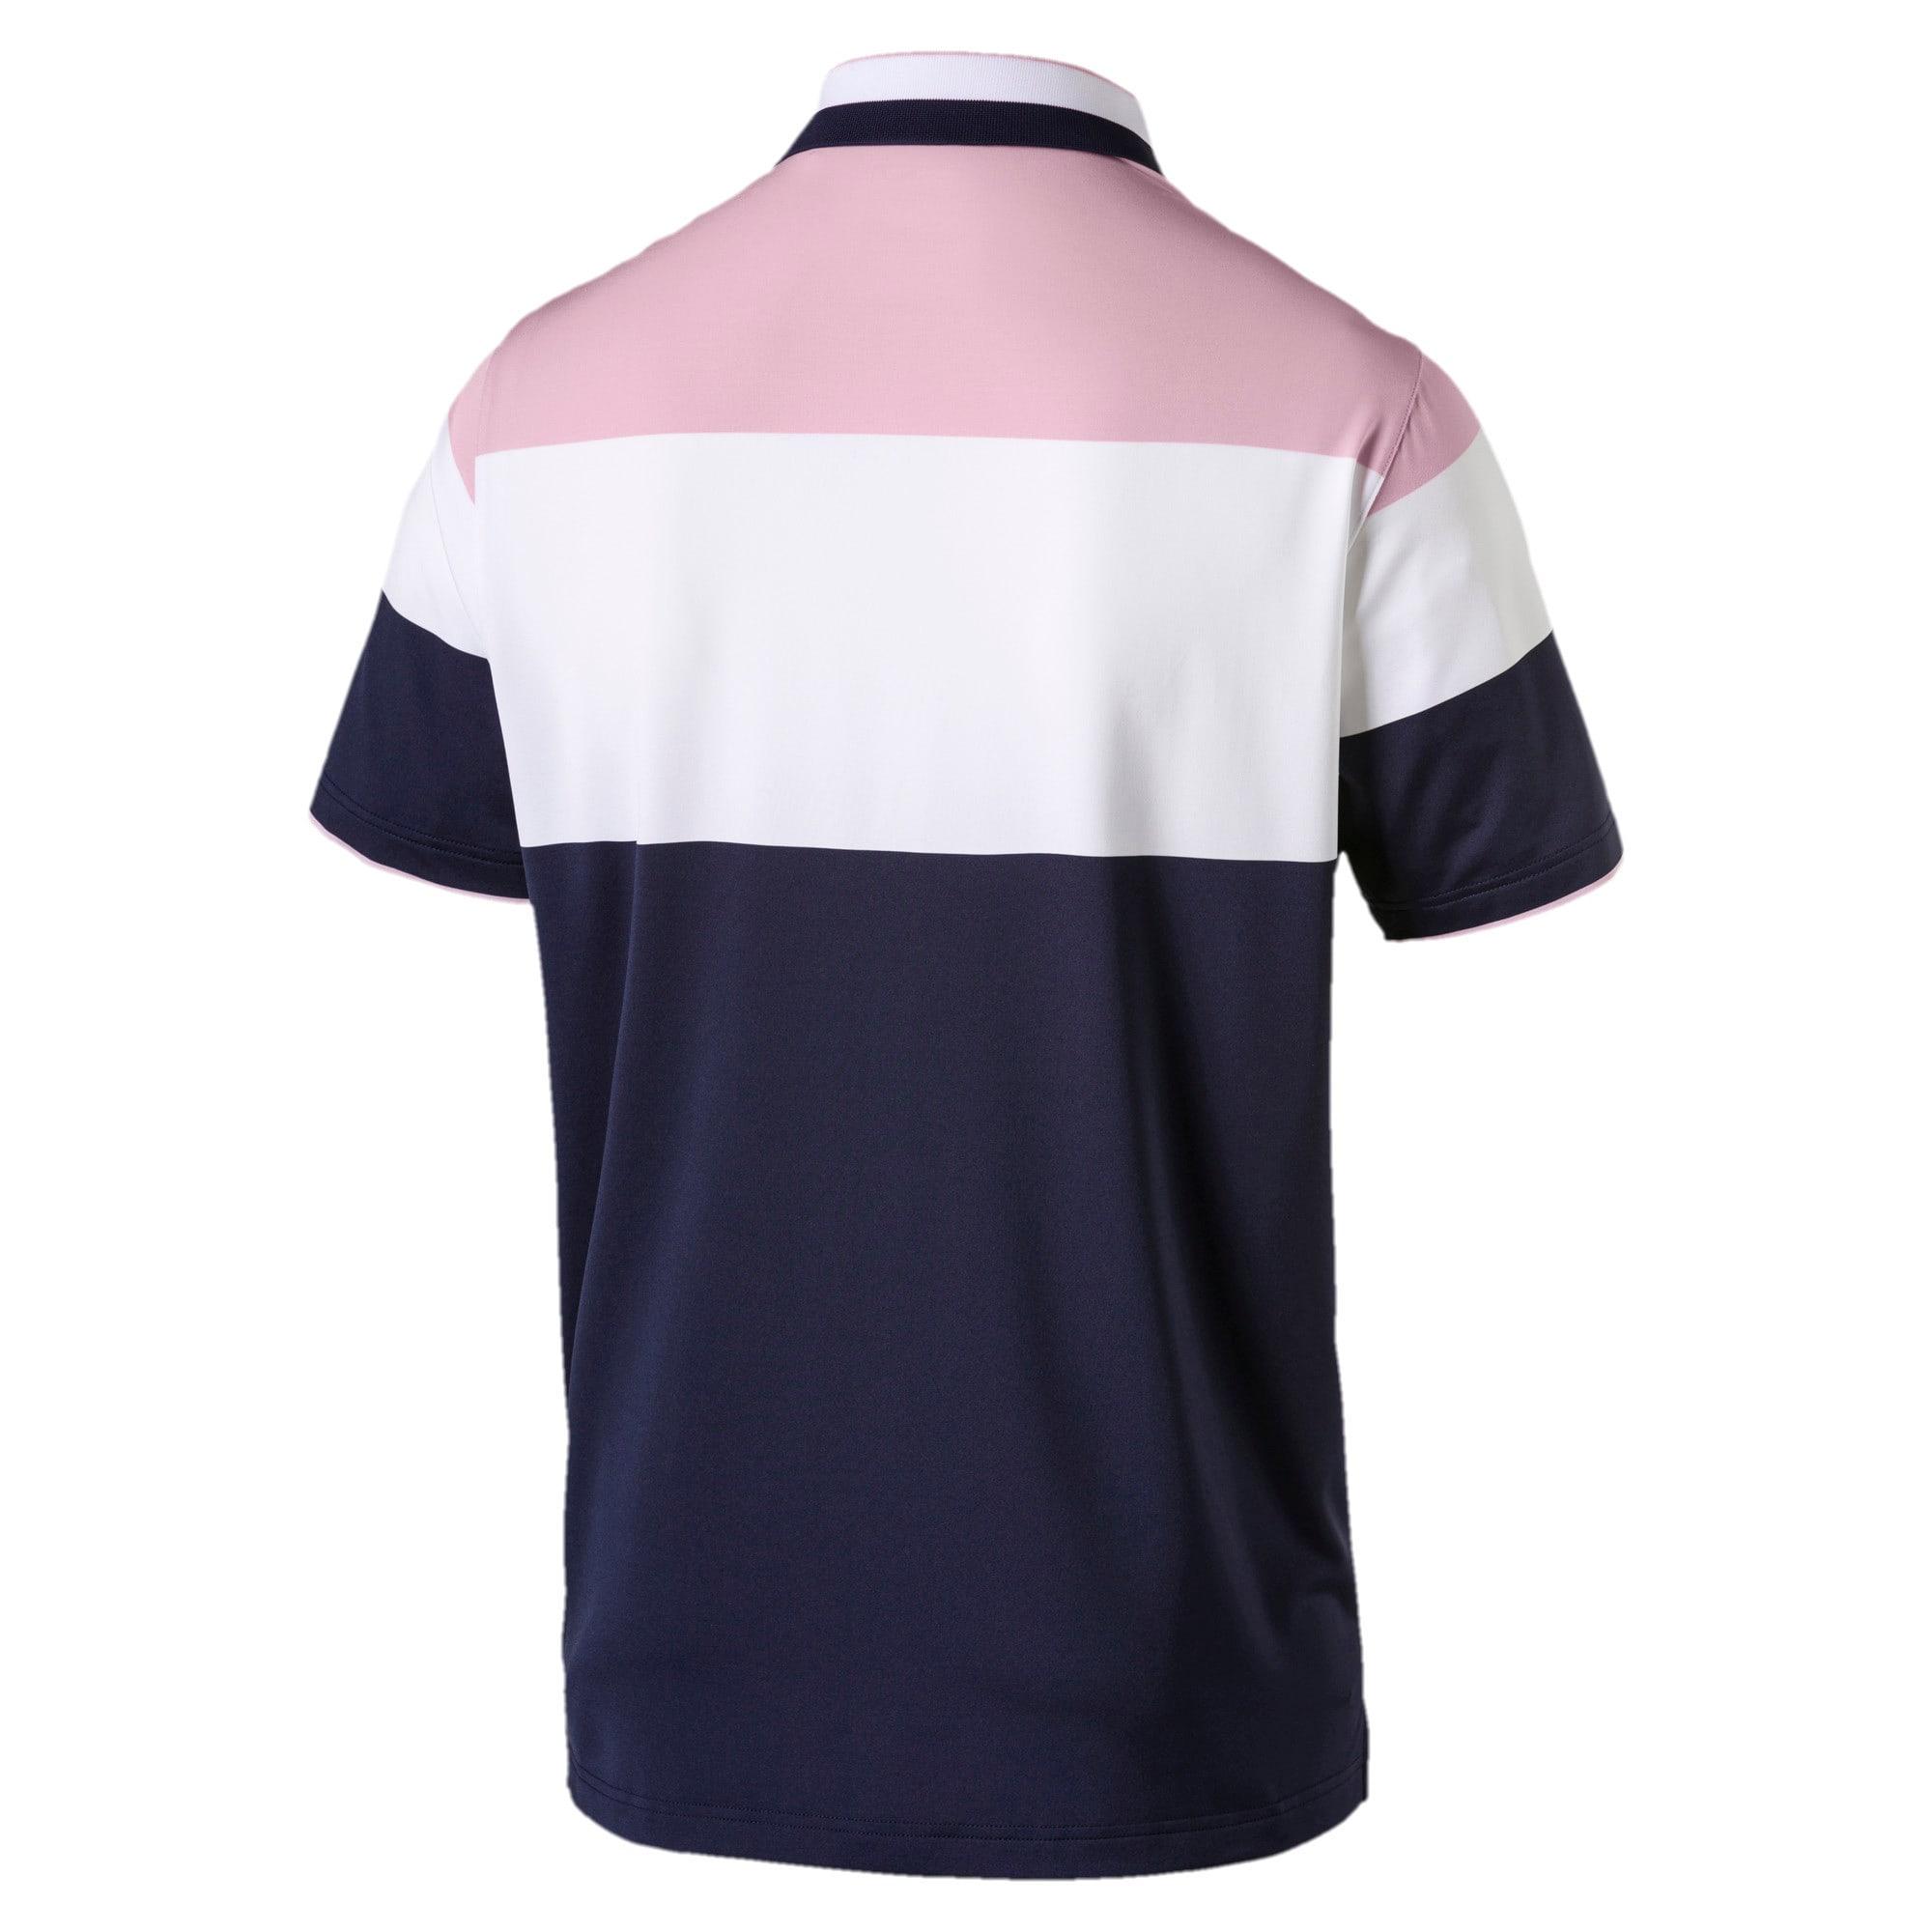 Thumbnail 5 of Nineties Men's Golf Polo, Pale Pink, medium